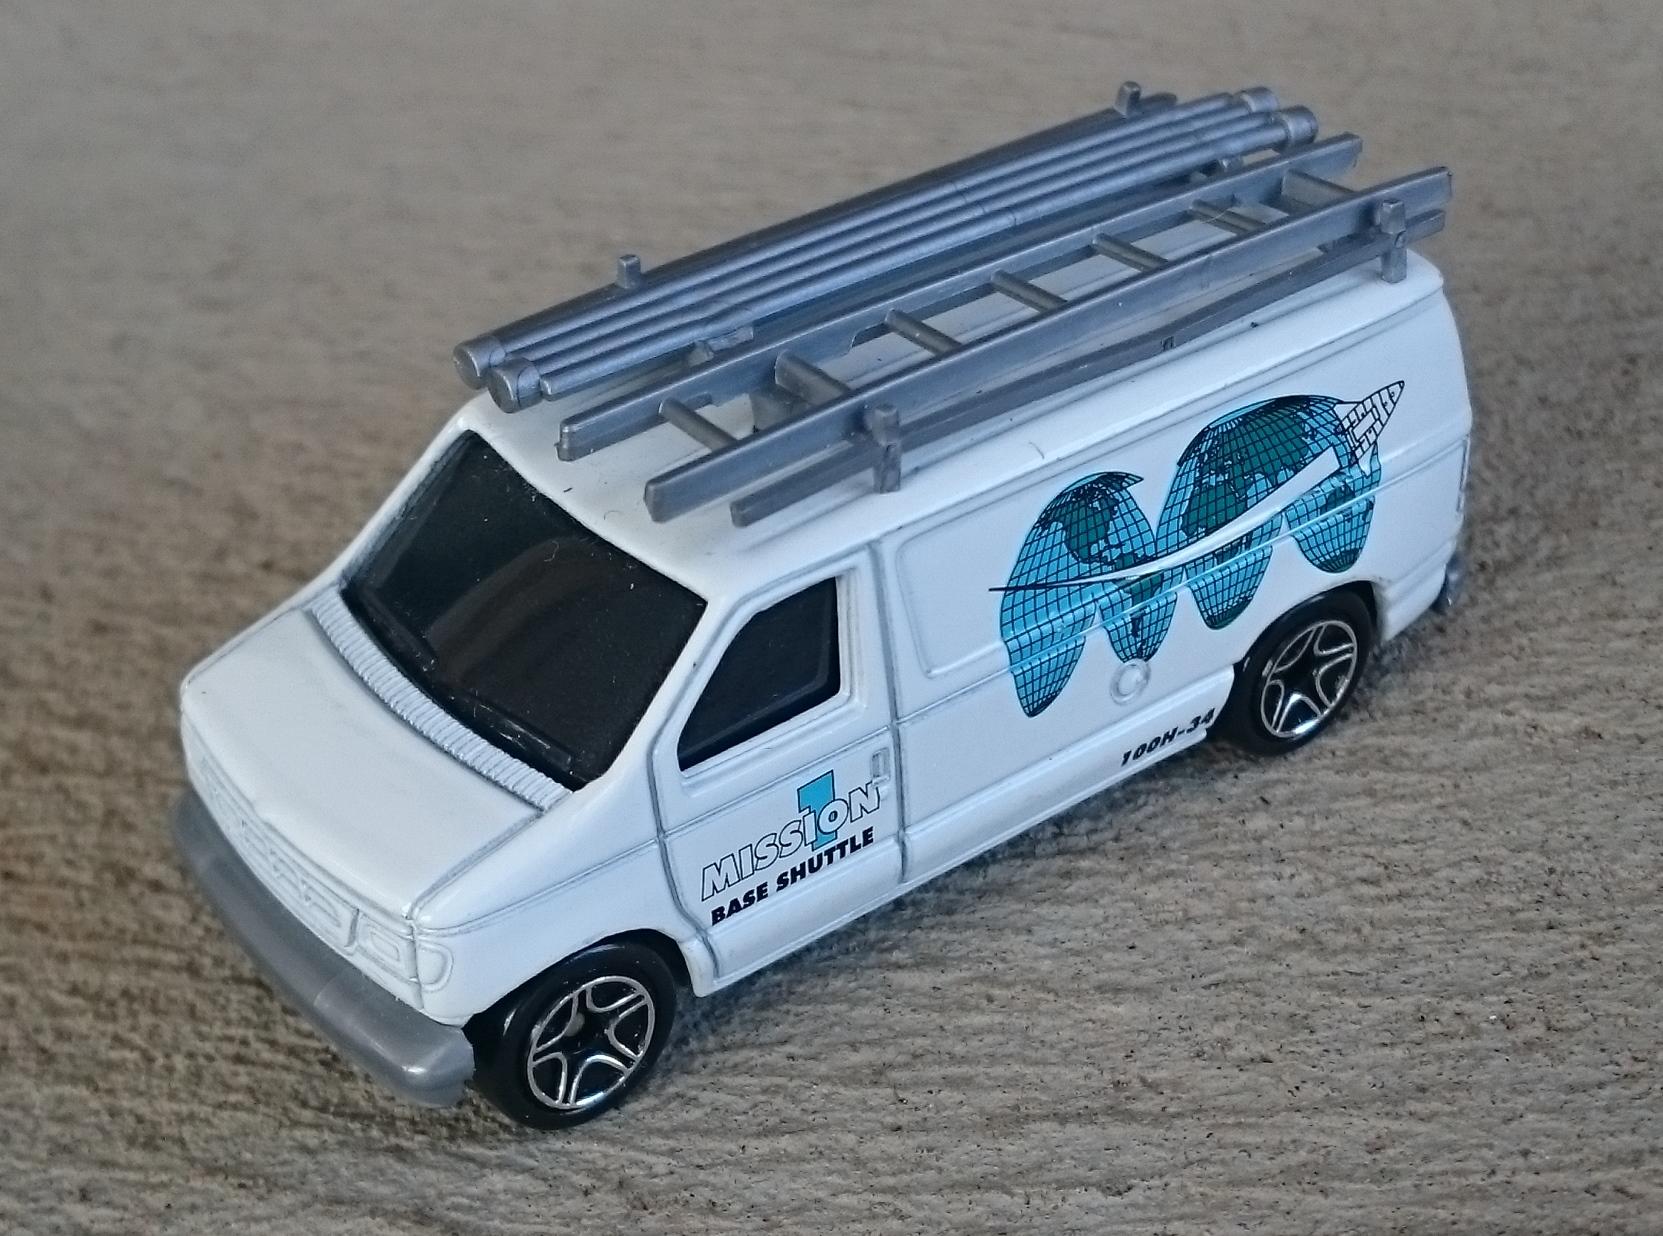 Ford Panel Van (MB444, Mission 1).JPG